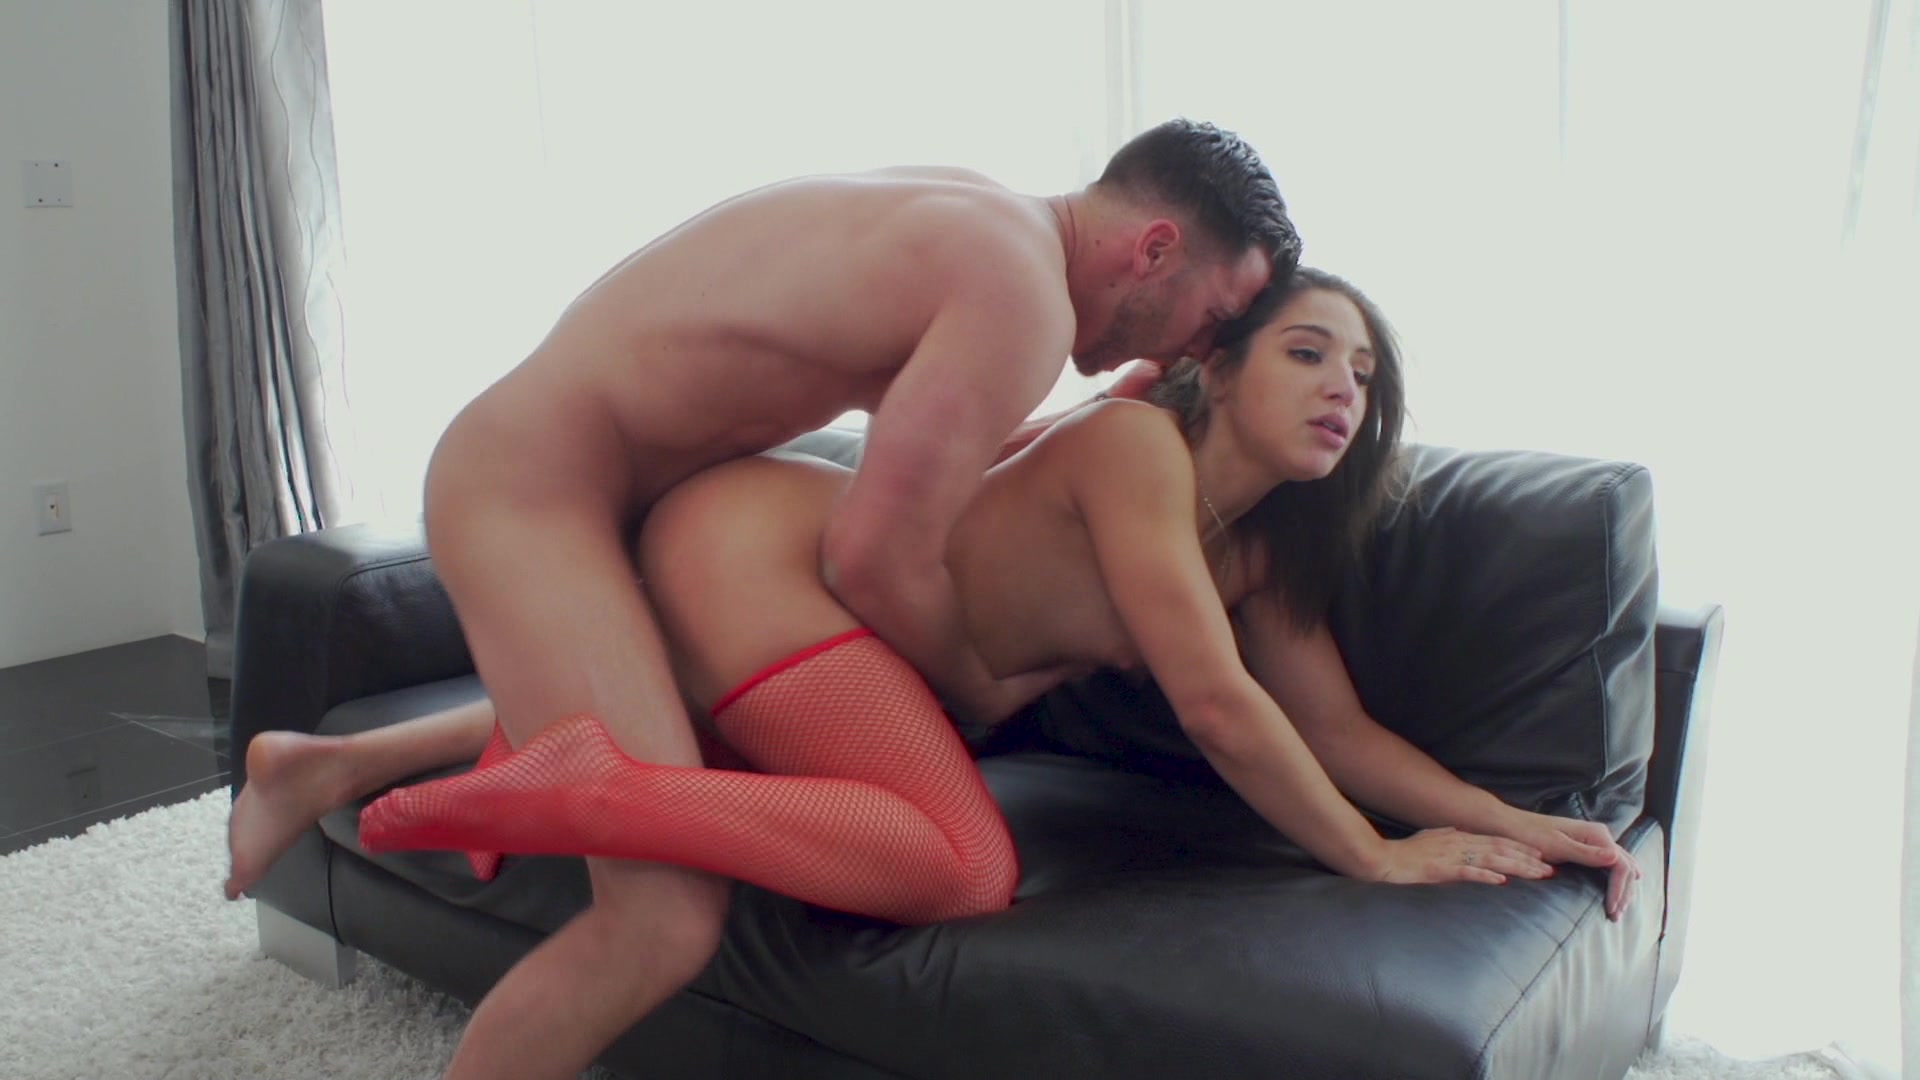 axel braun's big ass anal movie (2017) | adult dvd empire